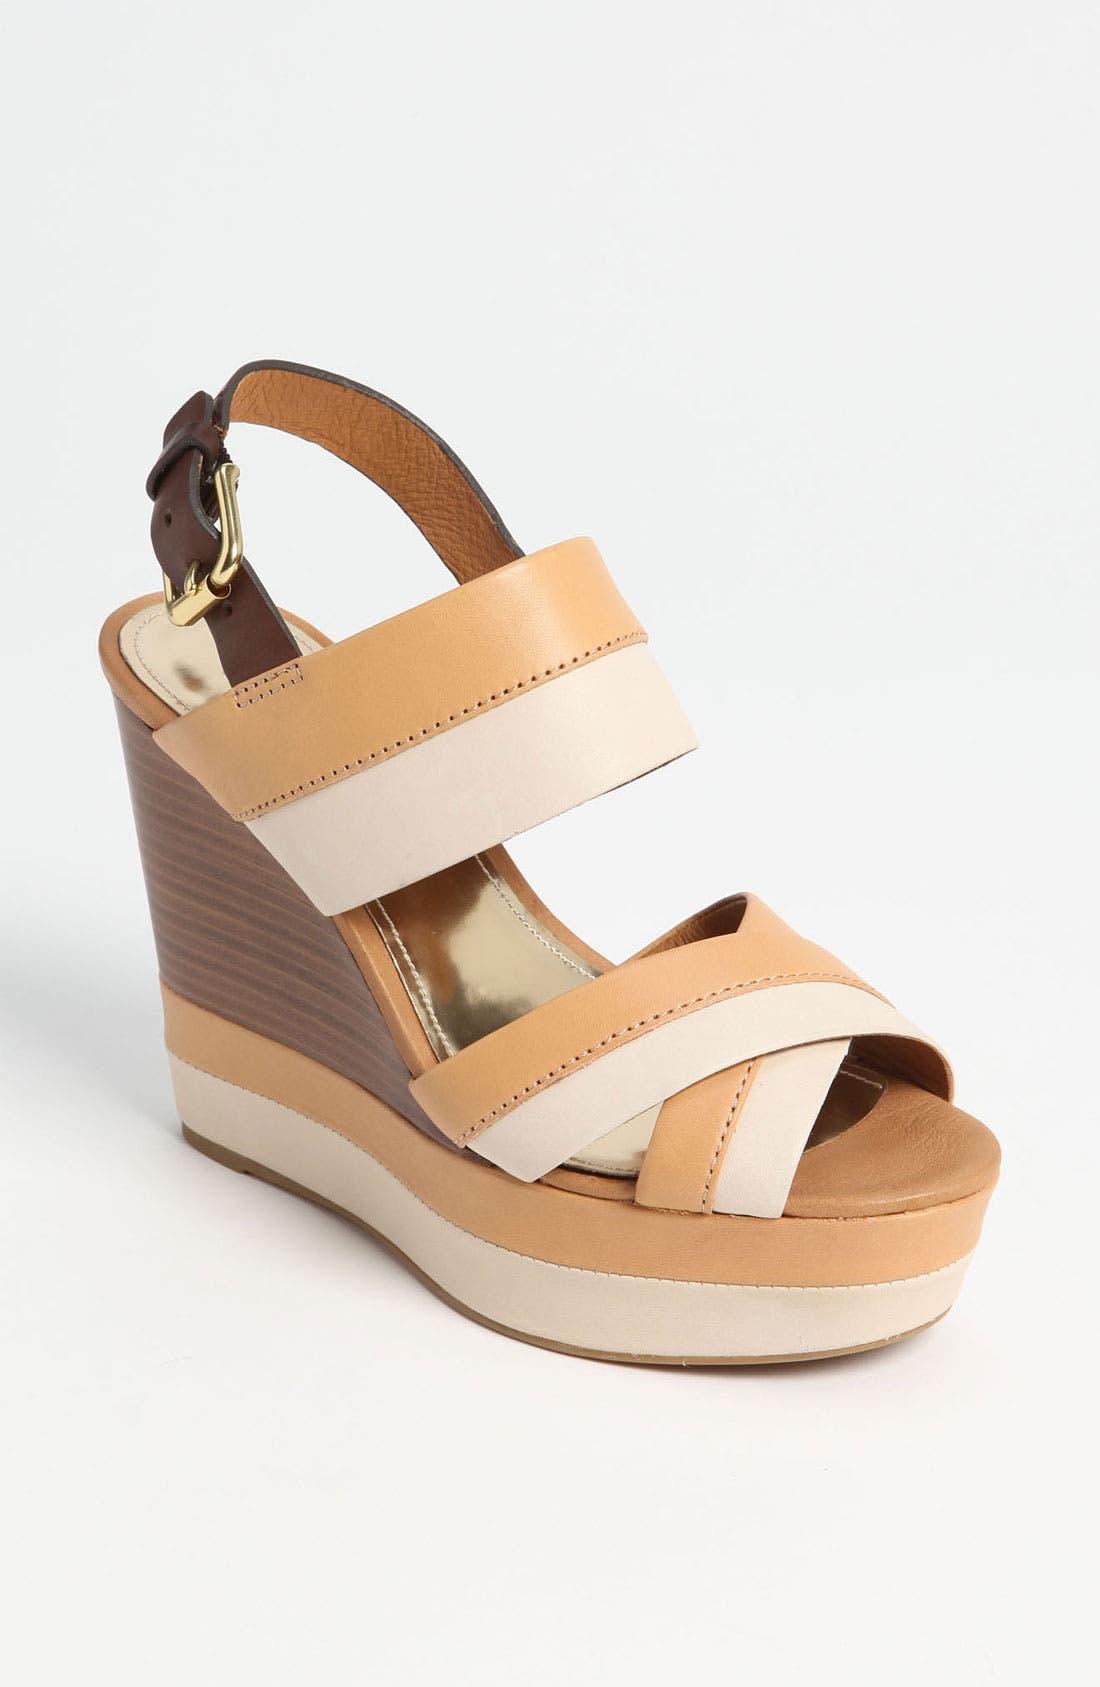 Alternate Image 1 Selected - COACH 'Gaile' Wedge Sandal